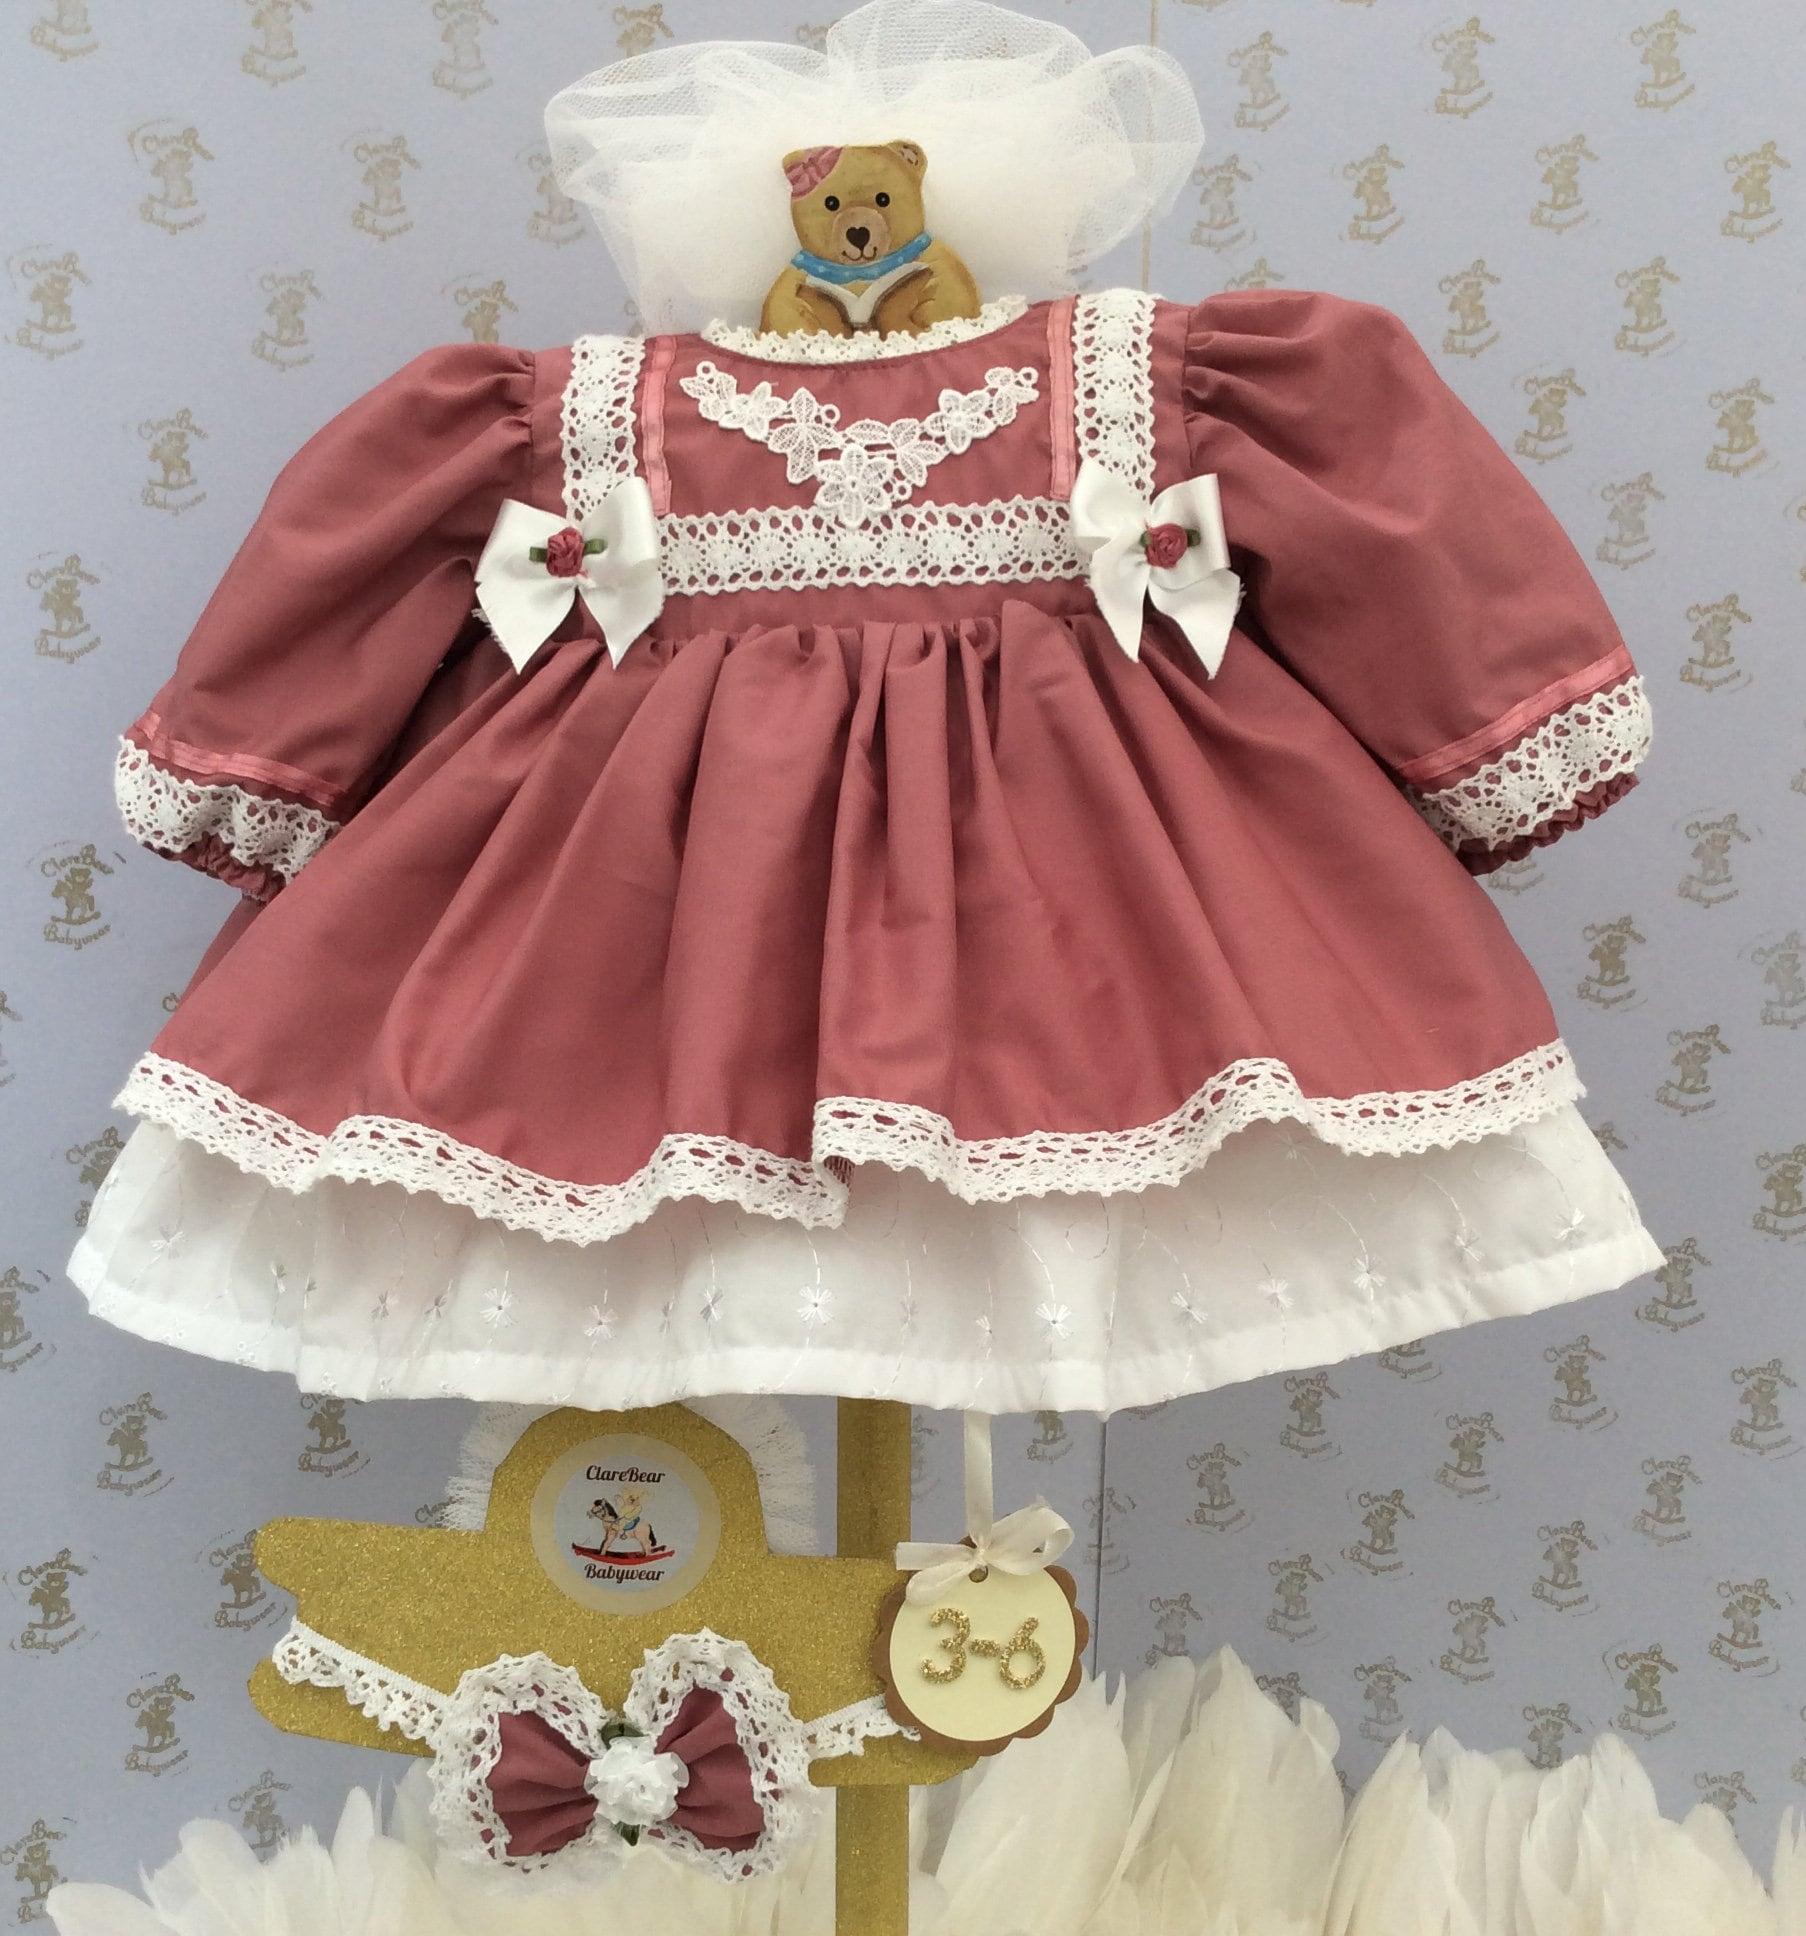 07329ae6b042 3-6m ready to ship Baby girls new Spanish style dress & | Etsy